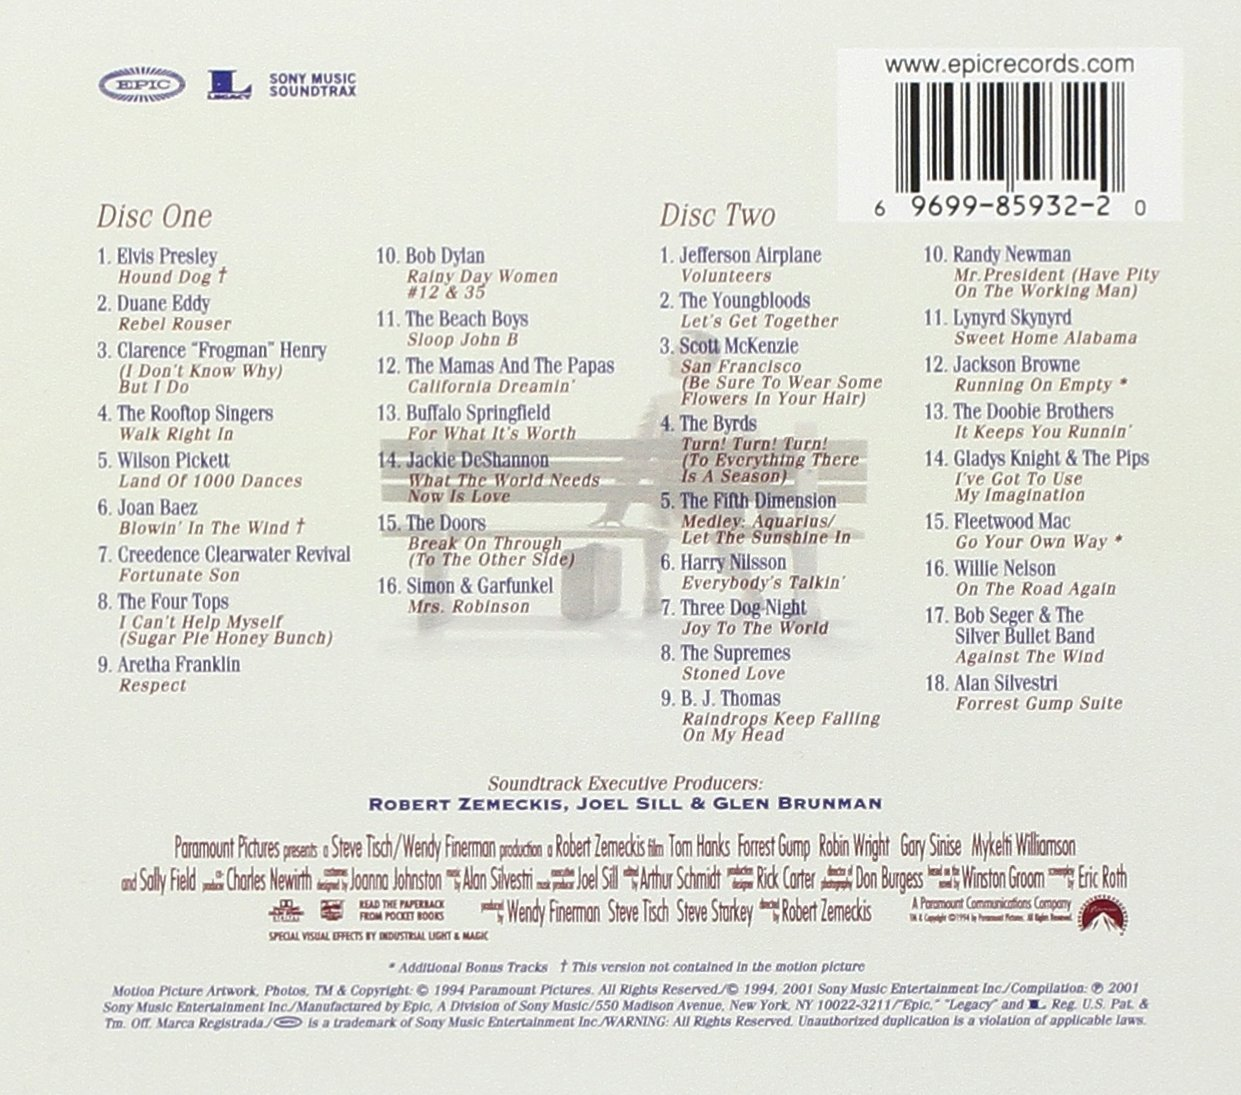 Double wedding soundtrack - Double Wedding Soundtrack 41